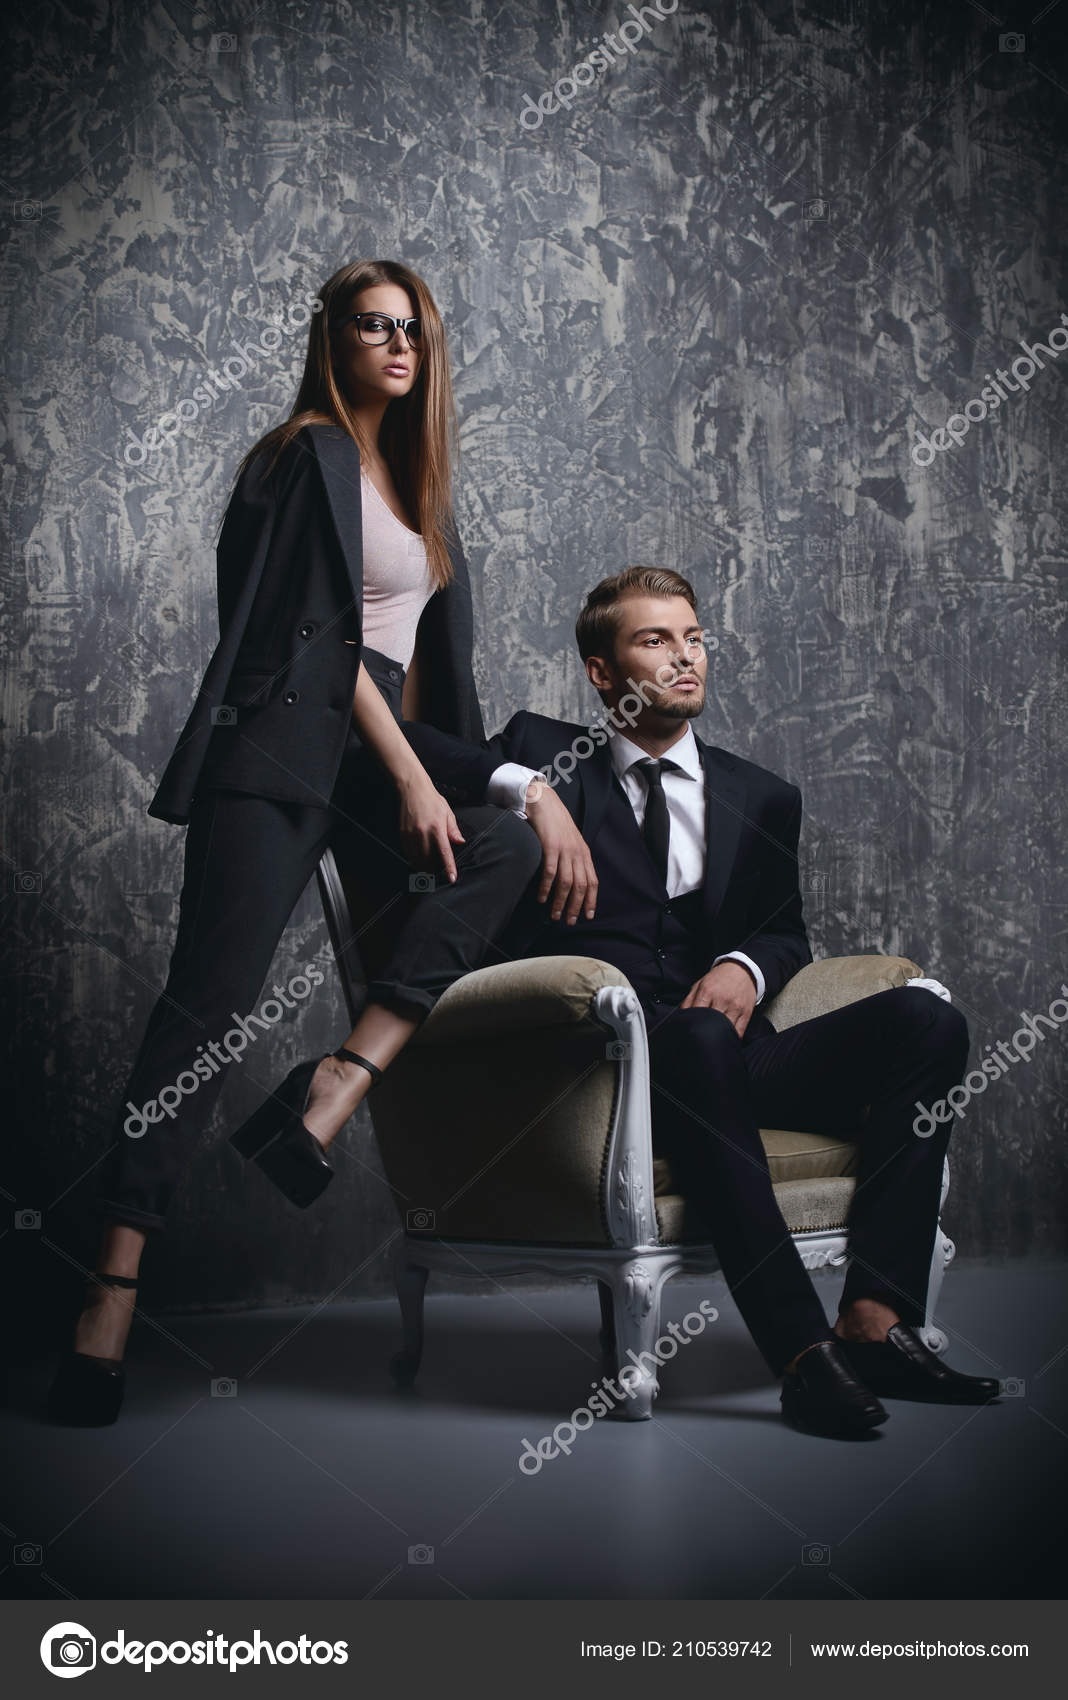 Dating fotos van kostuum